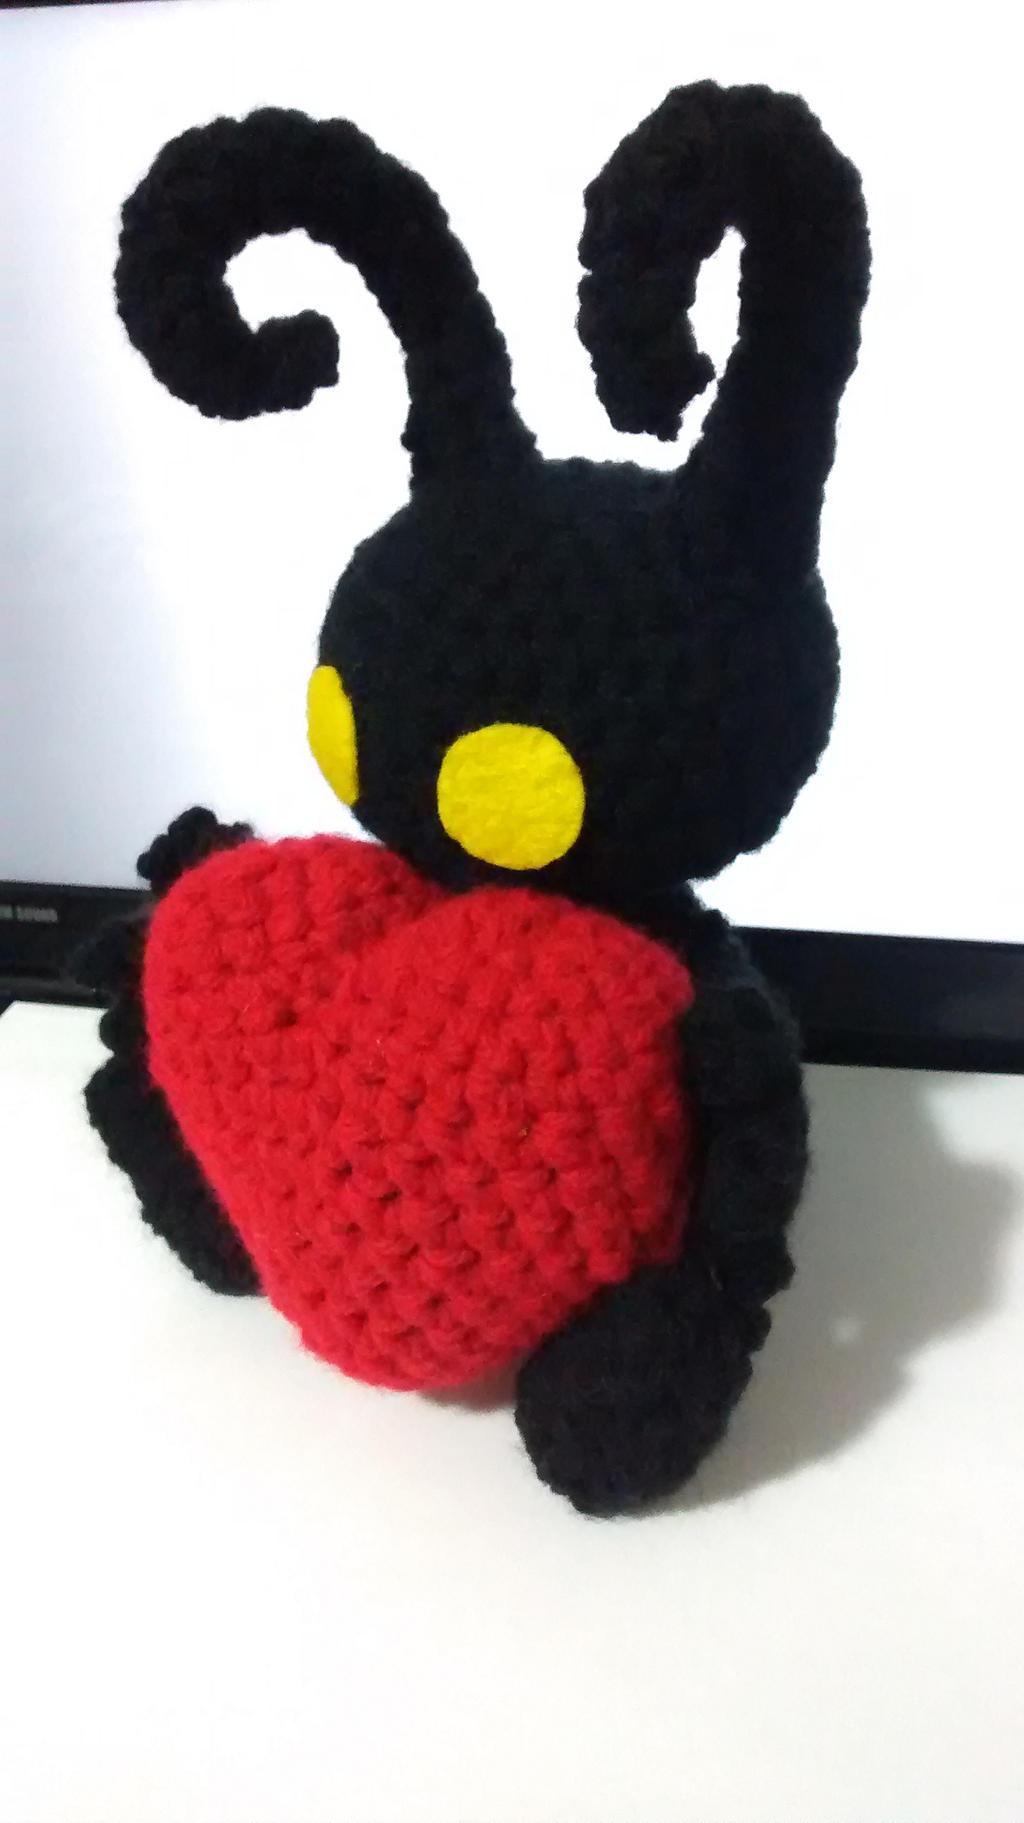 Kingdom Hearts Free Crochet Patterns : Crochet Heartless (Kingdom Hearts) by 37896048978416492157 ...